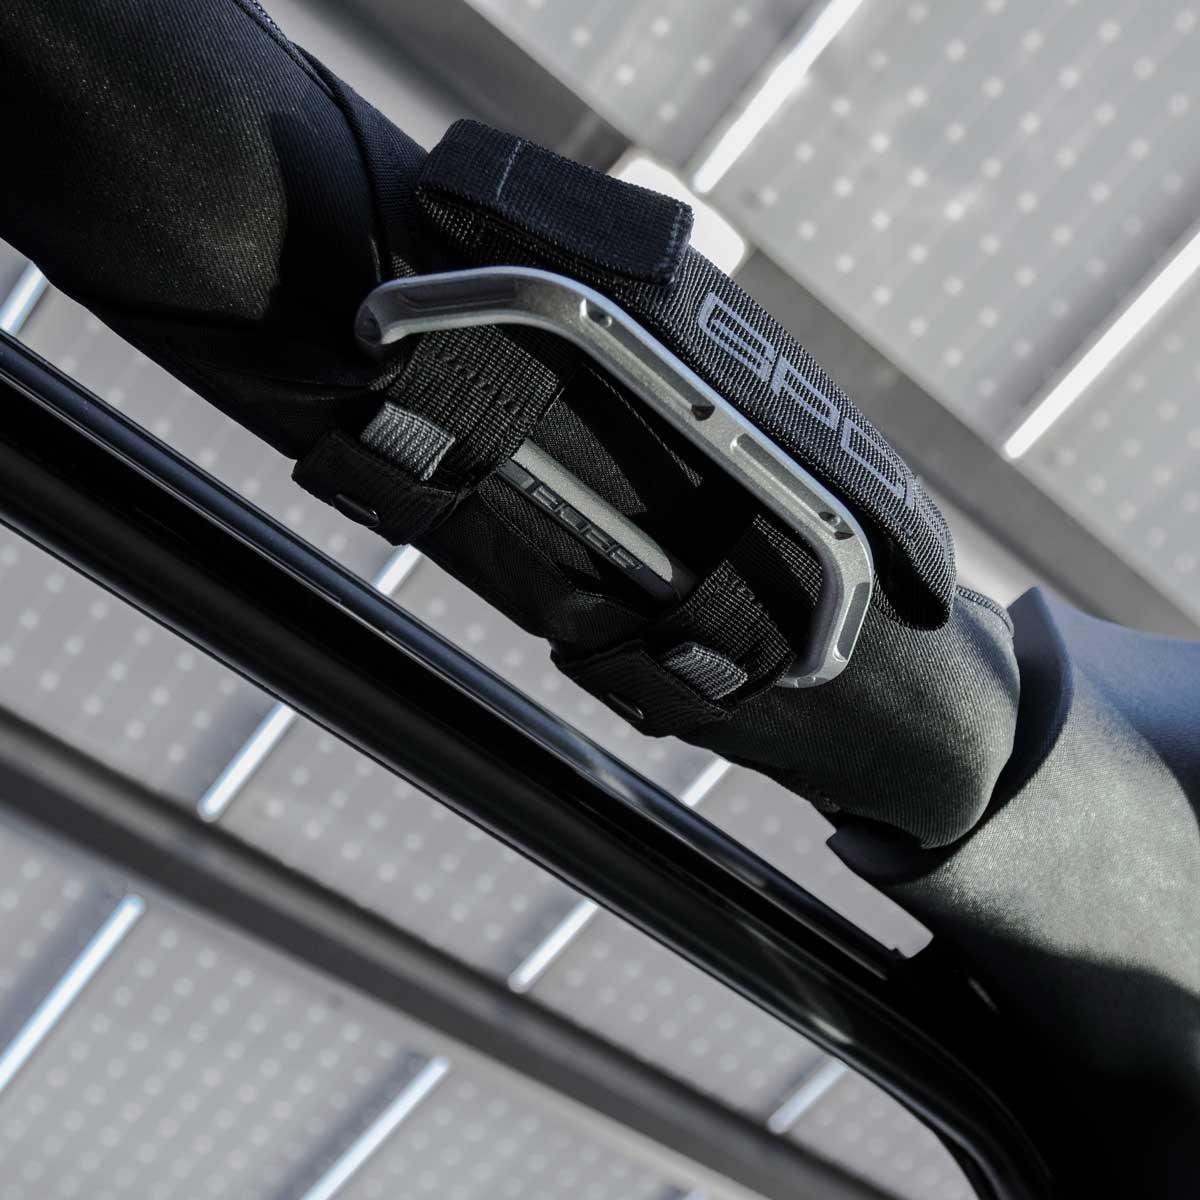 Pair, Jet Black Patented GP-Grip LITE for Jeep Wrangler JL JT JK Sport Sahara Freedom Rubicon 4DR 2DR 2007-2020 with 3 roll bar GPCA Metal Grab Handle